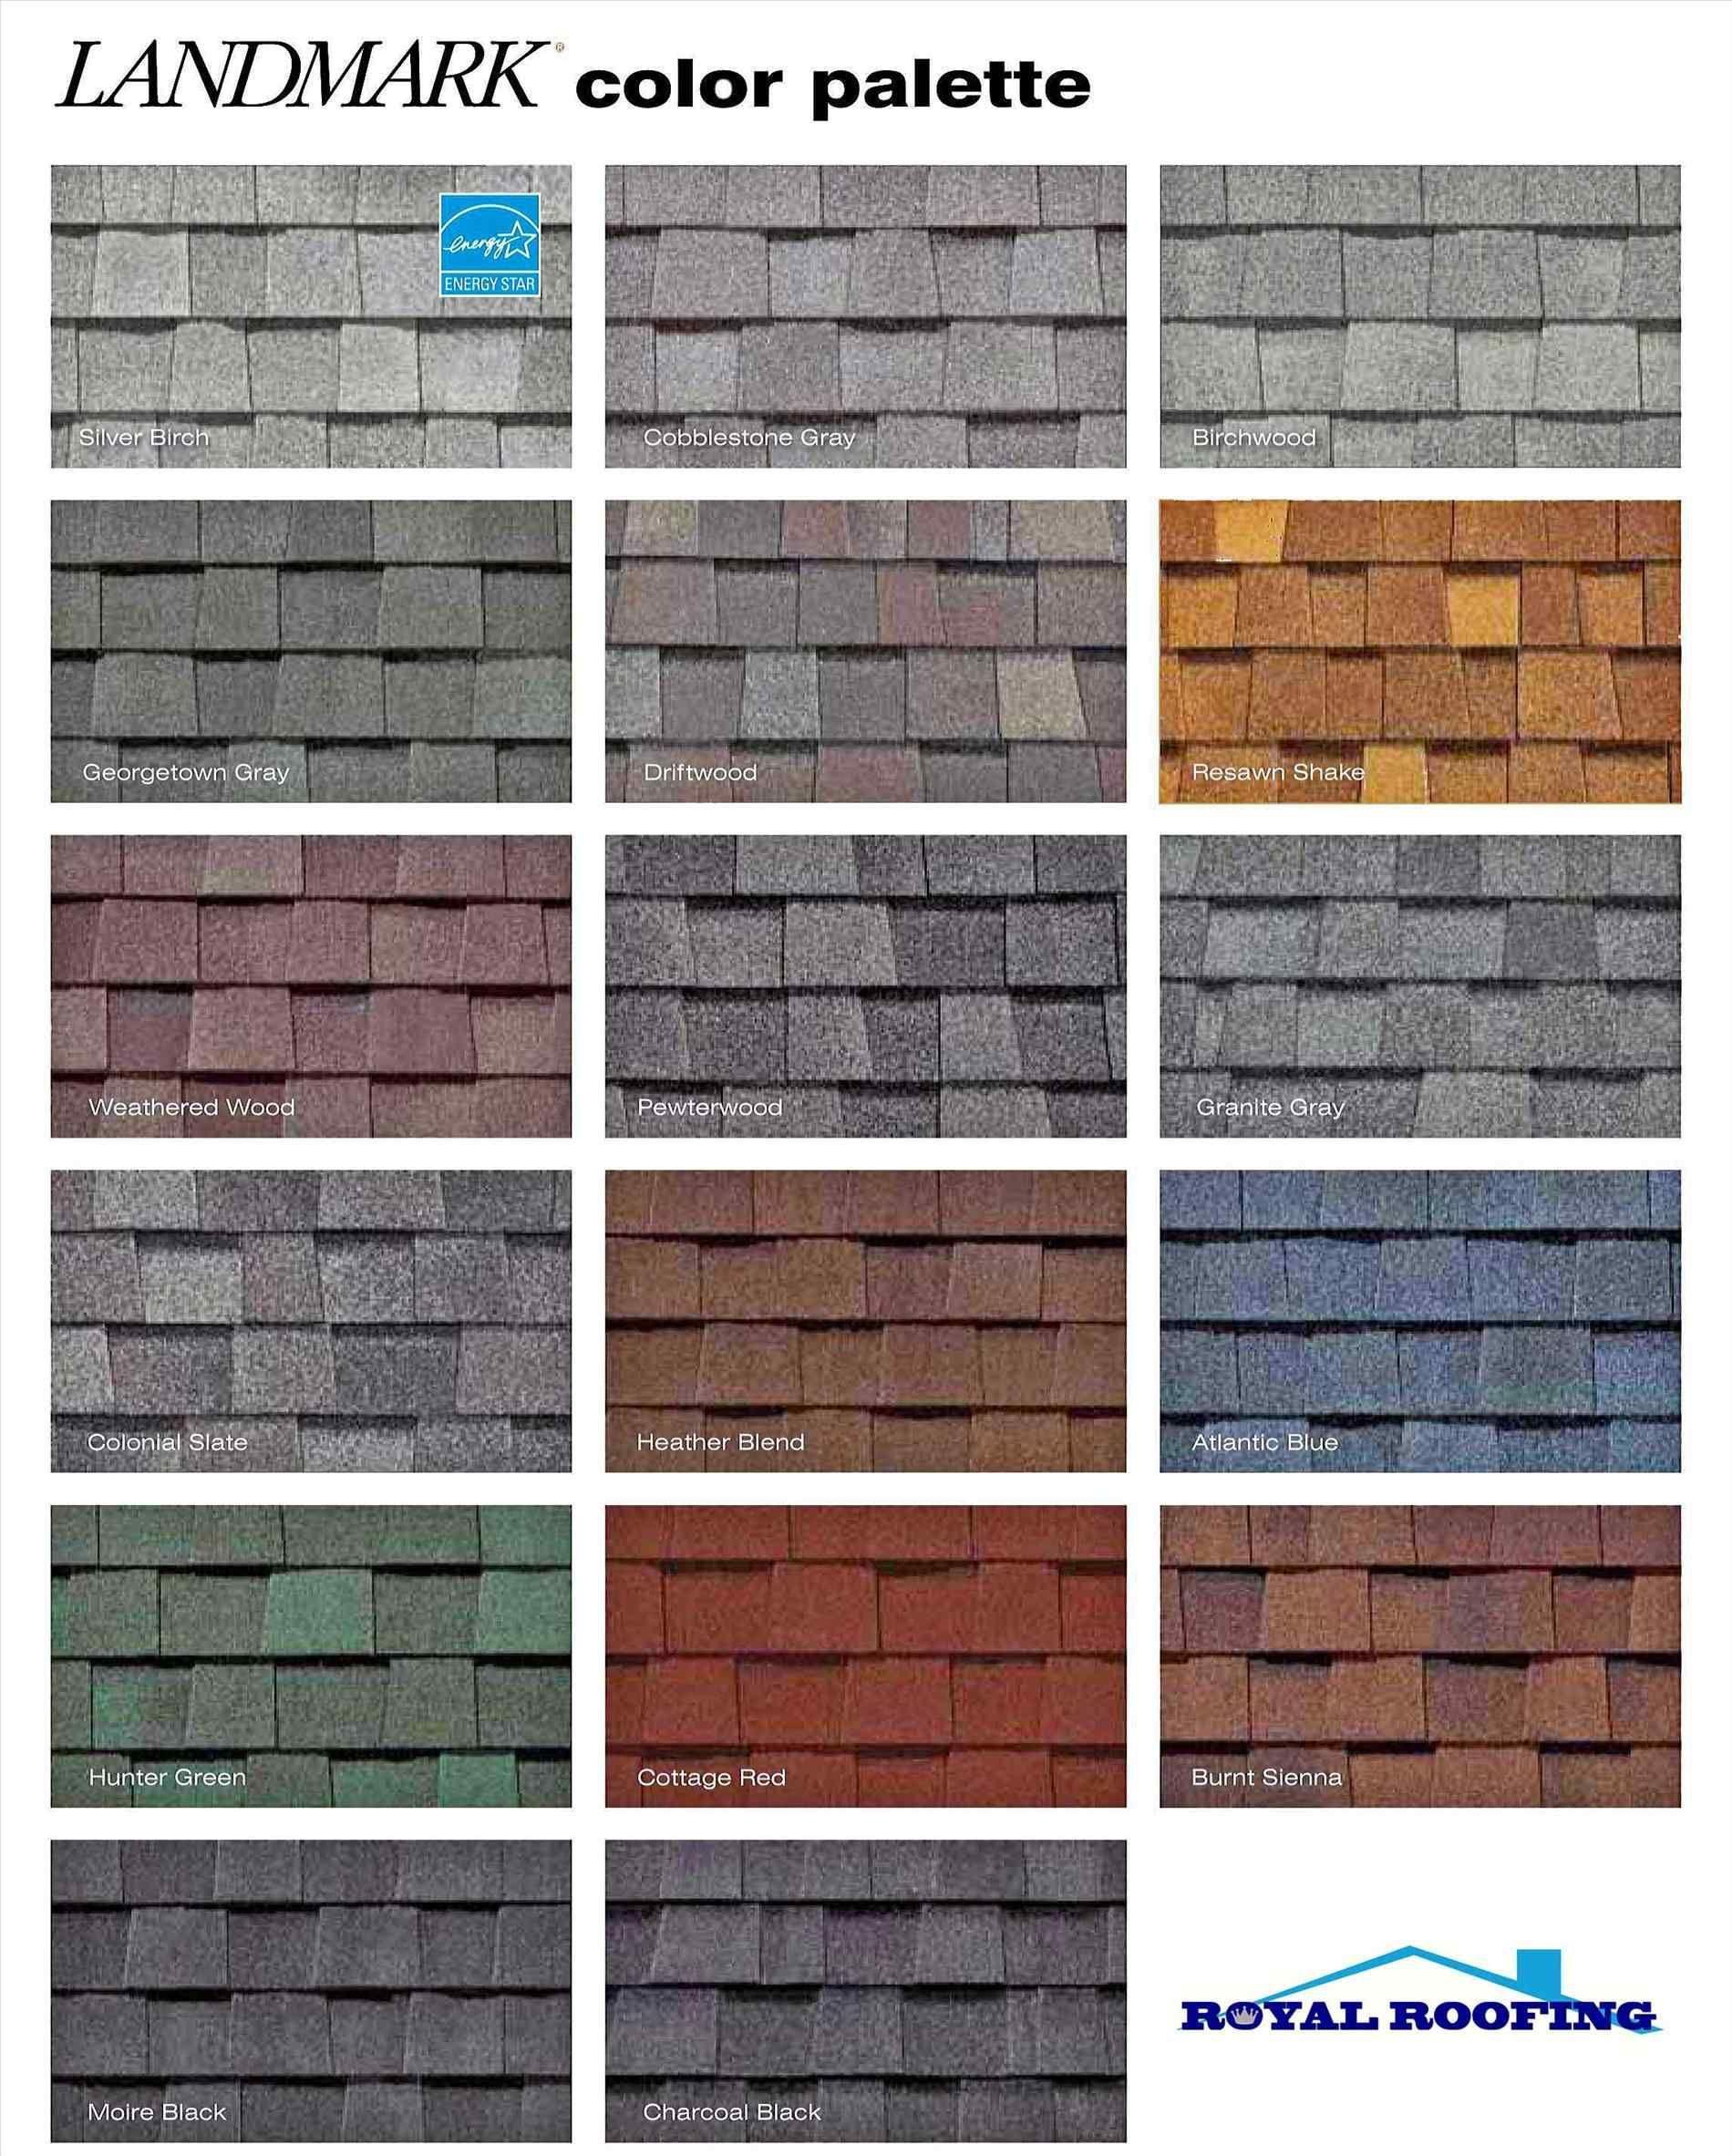 Best Energy Star Roof Shingles Shingle Colors Roof Shingle 400 x 300